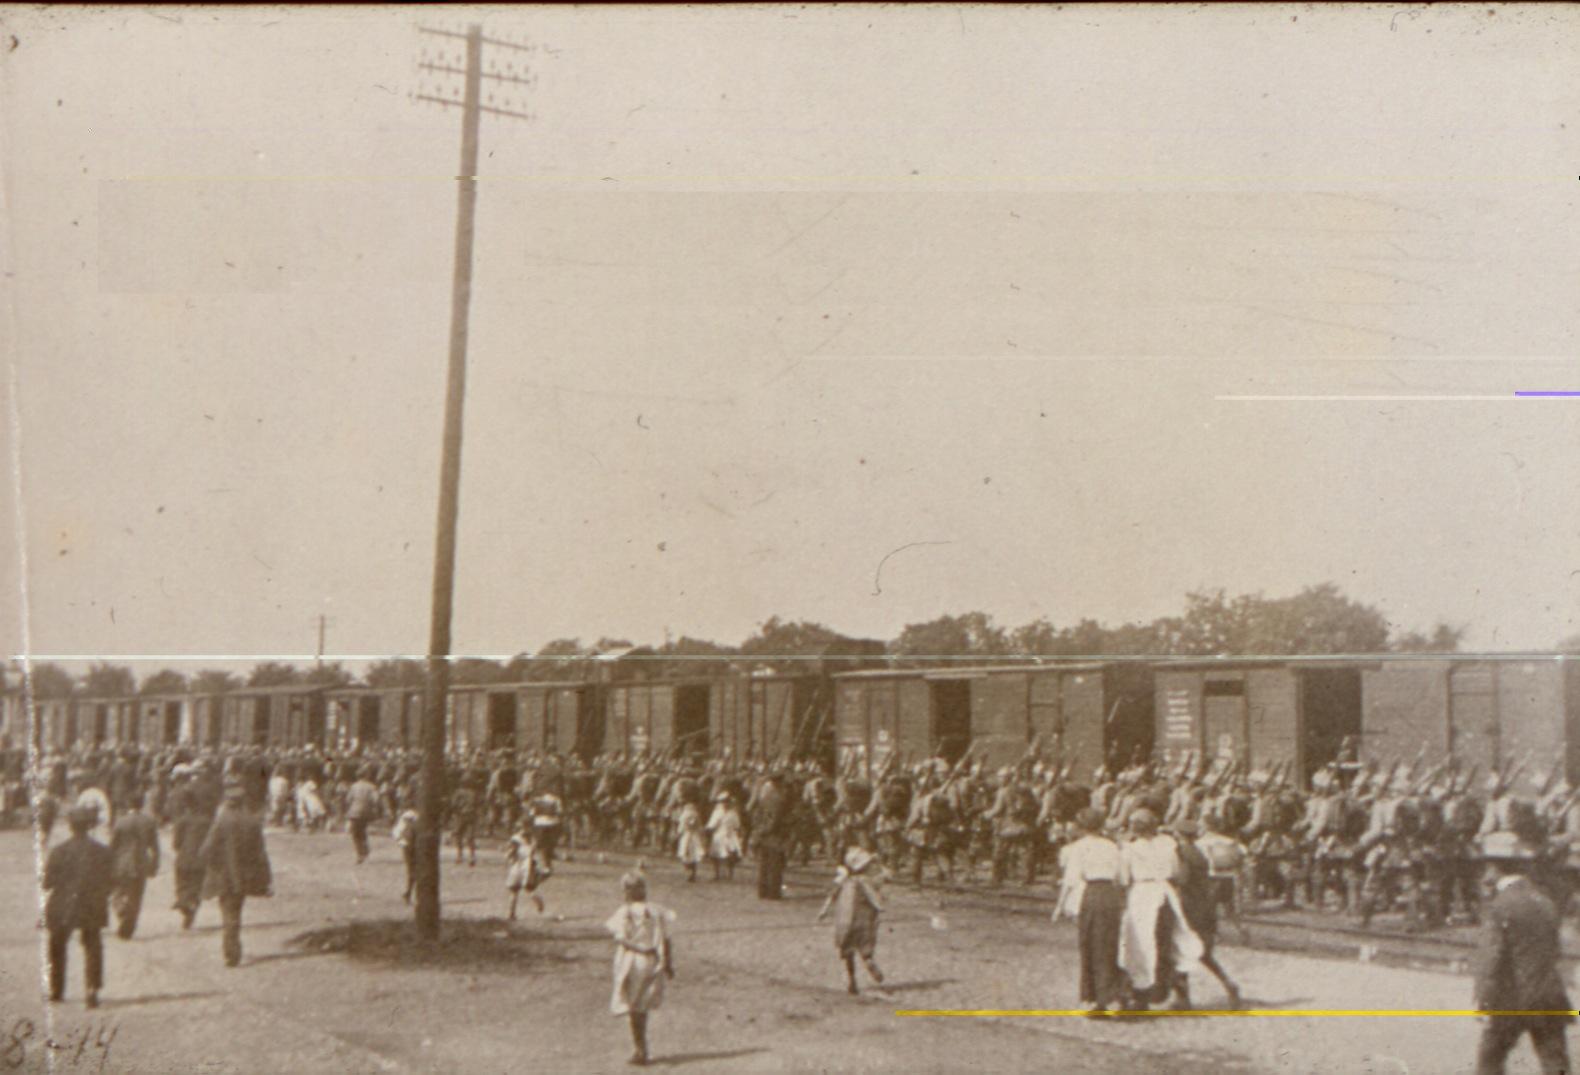 8. august 1914. Regiment 84 forlader Haderslev